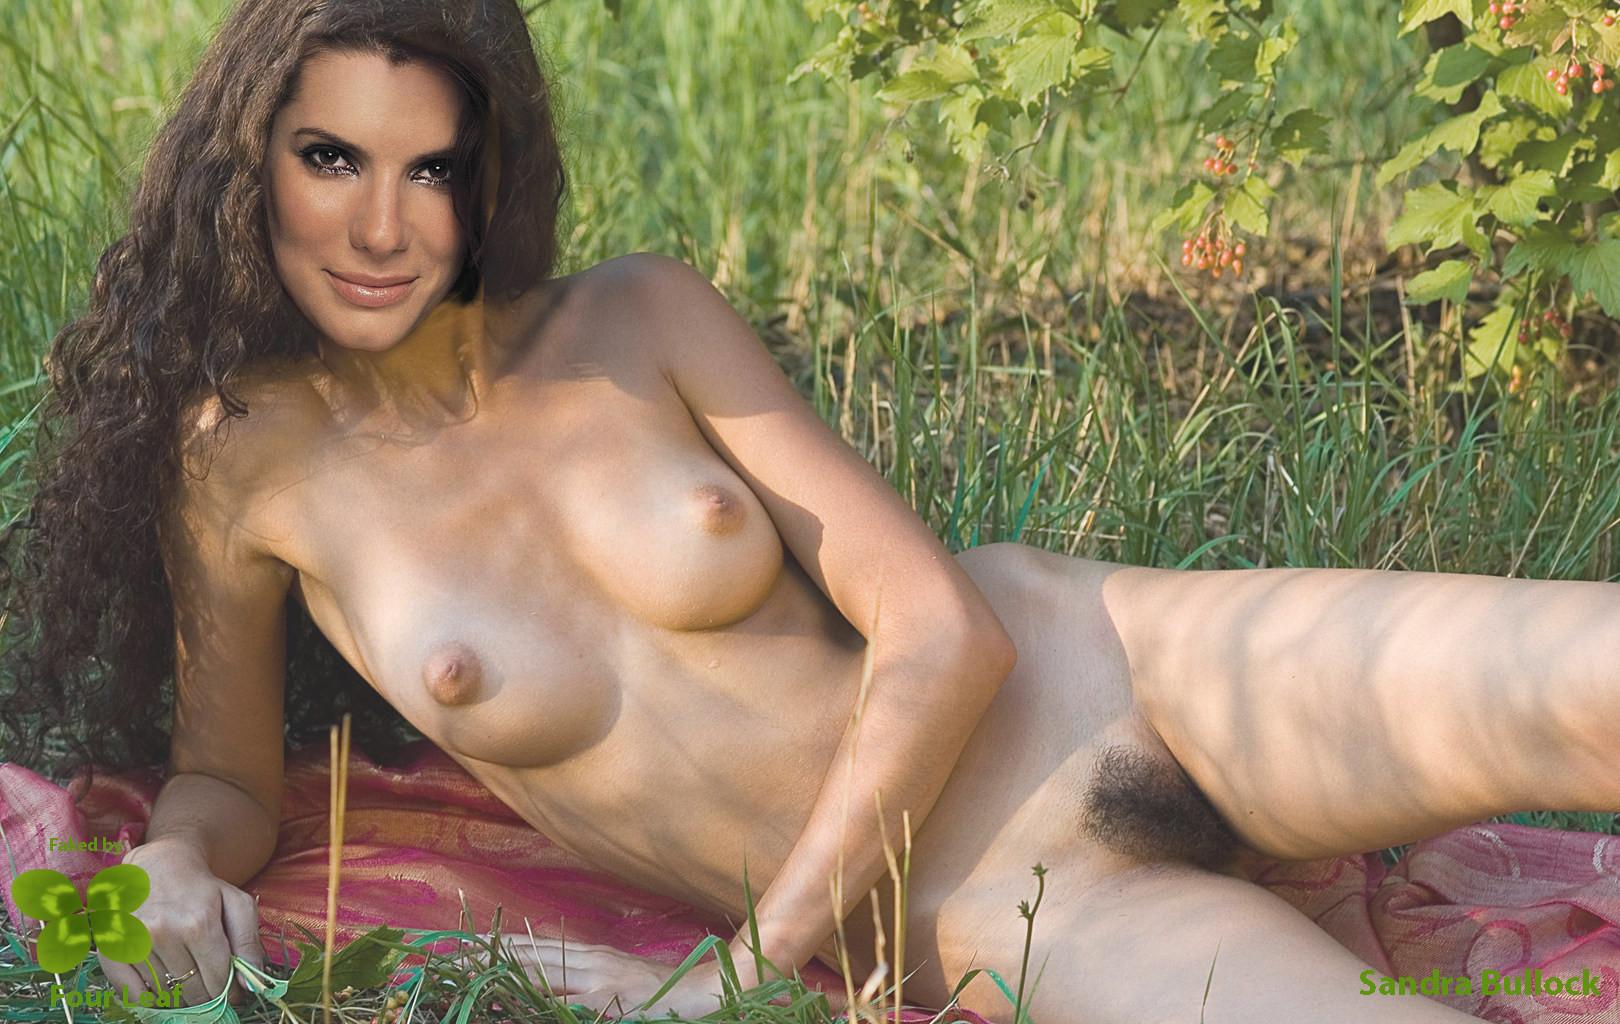 Фото девушек с мохнатыми писками 3 фотография